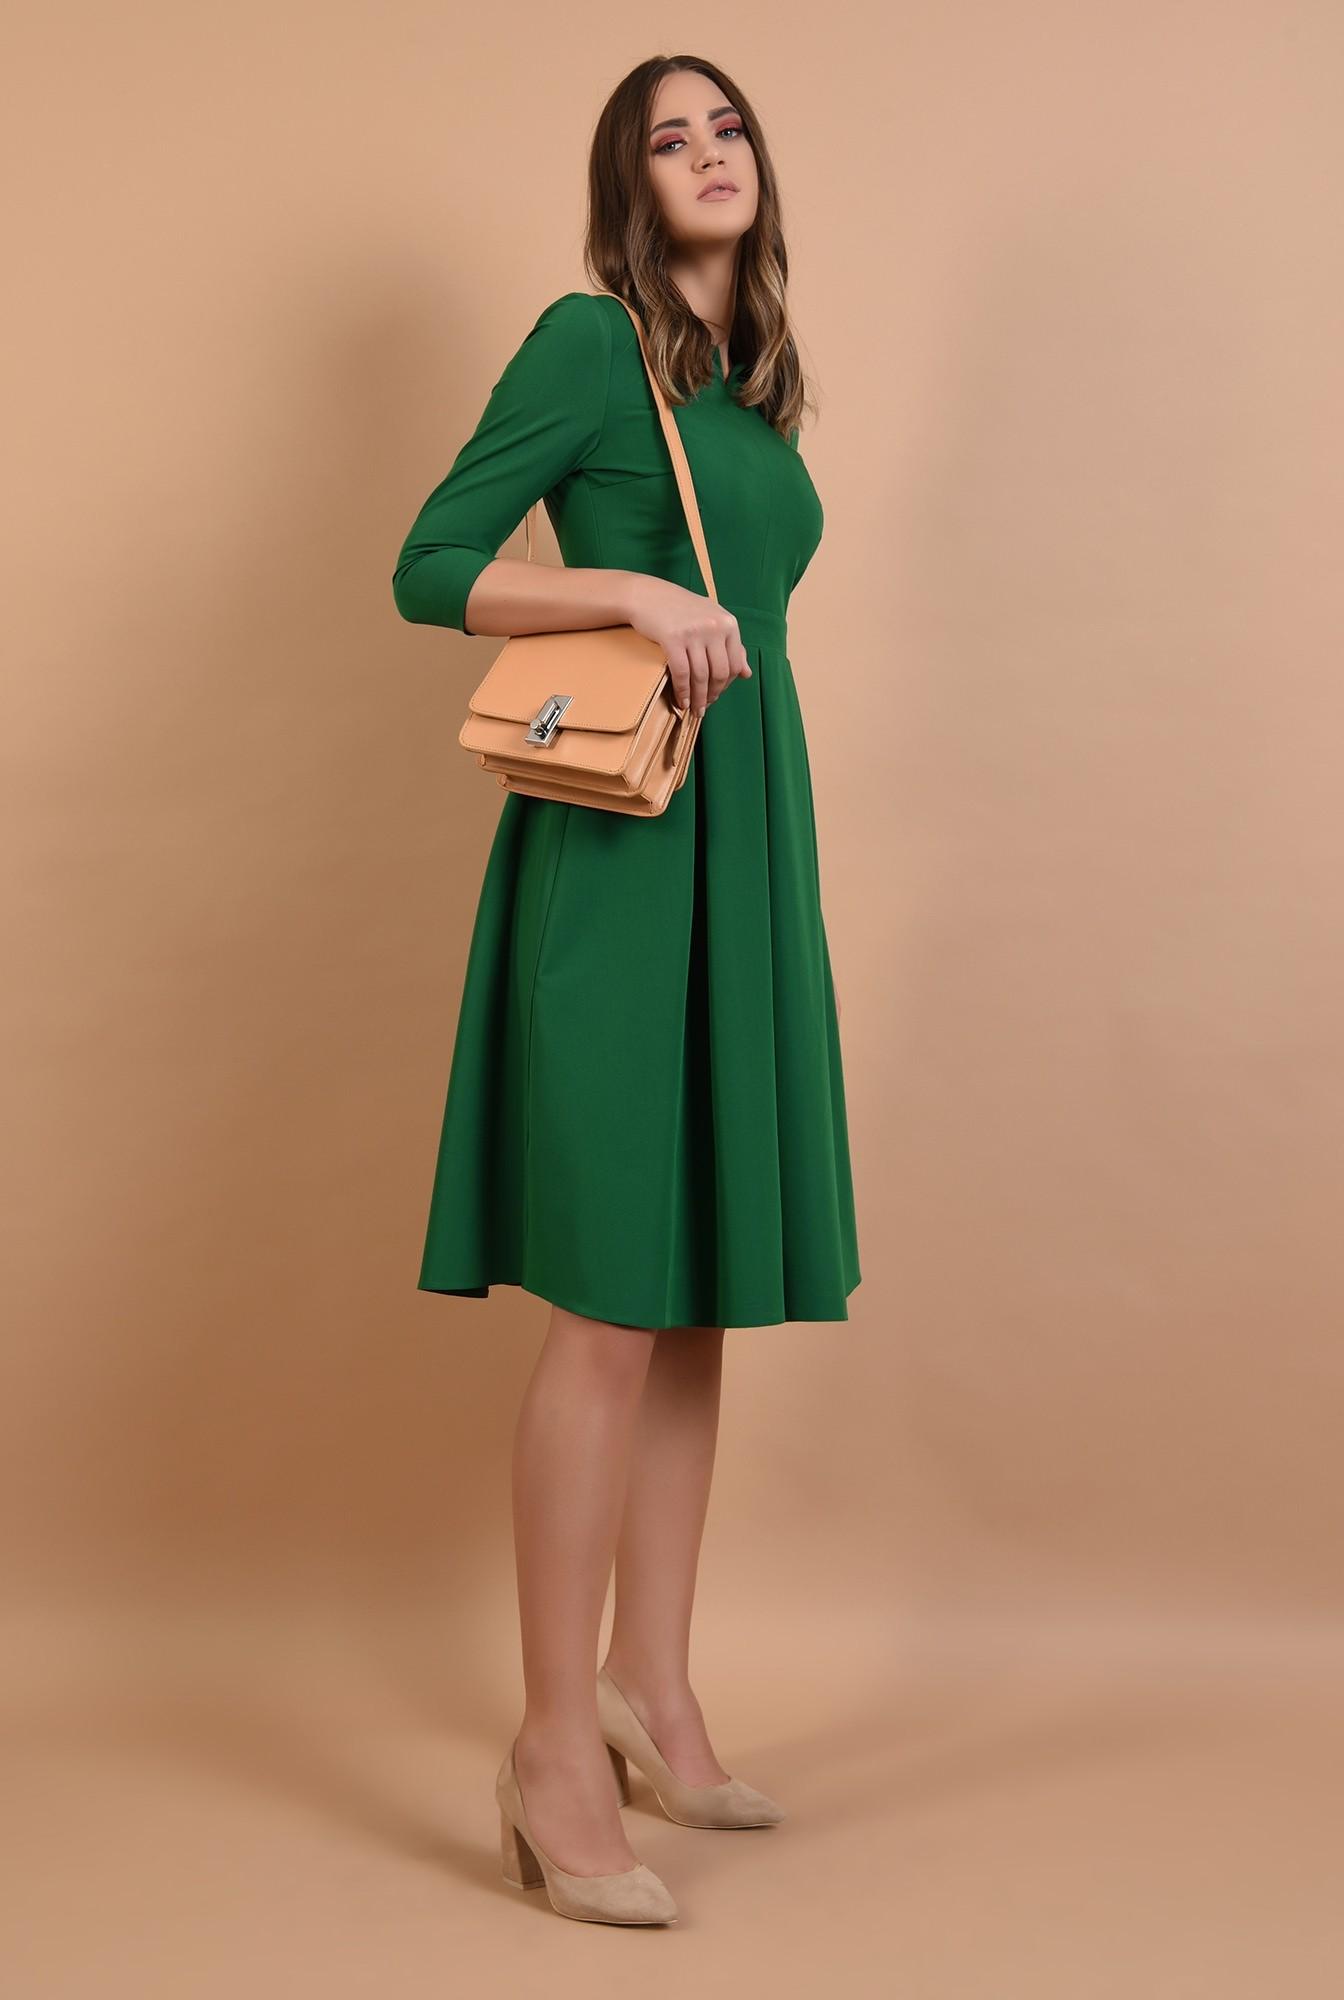 3 - rochie midi, evazata, verde, cu pliseuri, fenta la decolteu, Poema